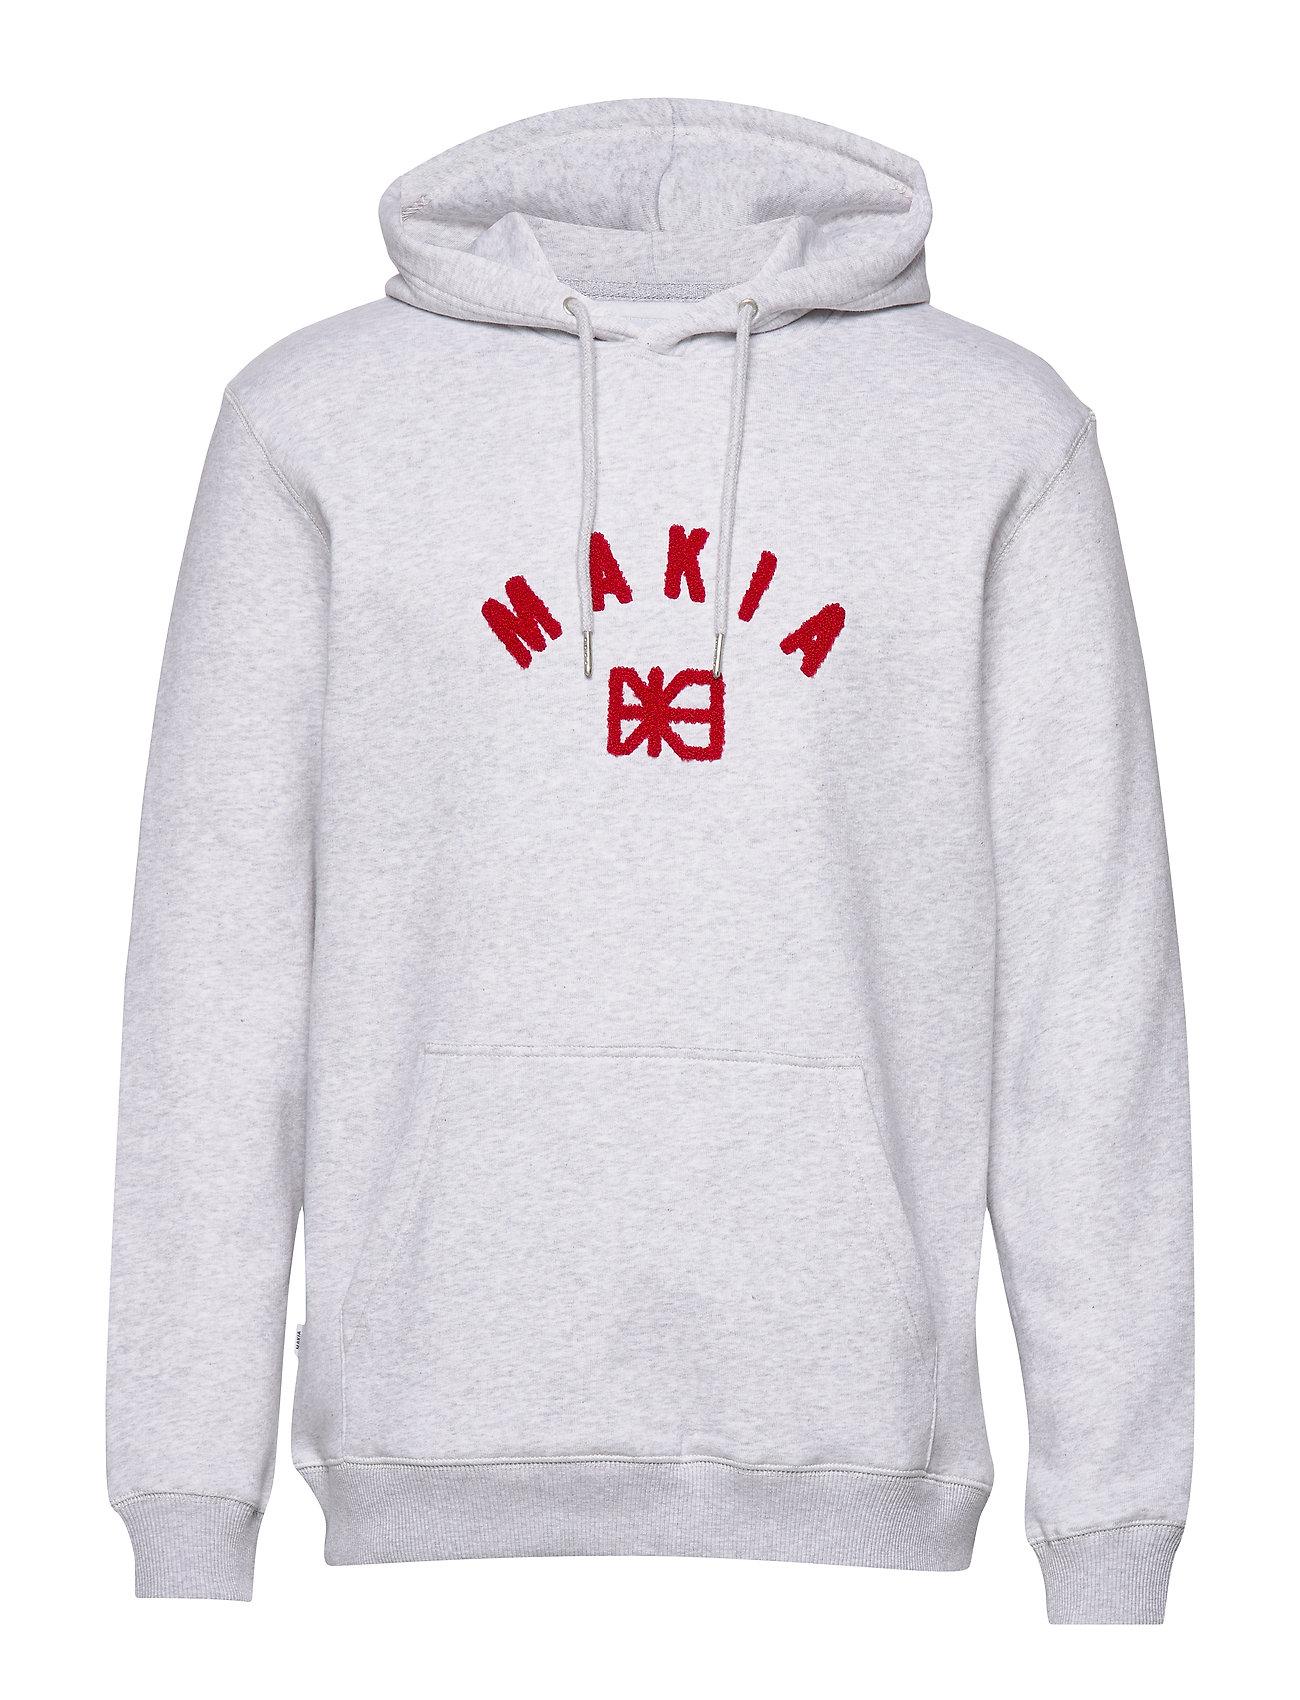 Makia Brand Hooded Sweatshirt - LIGHT GREY